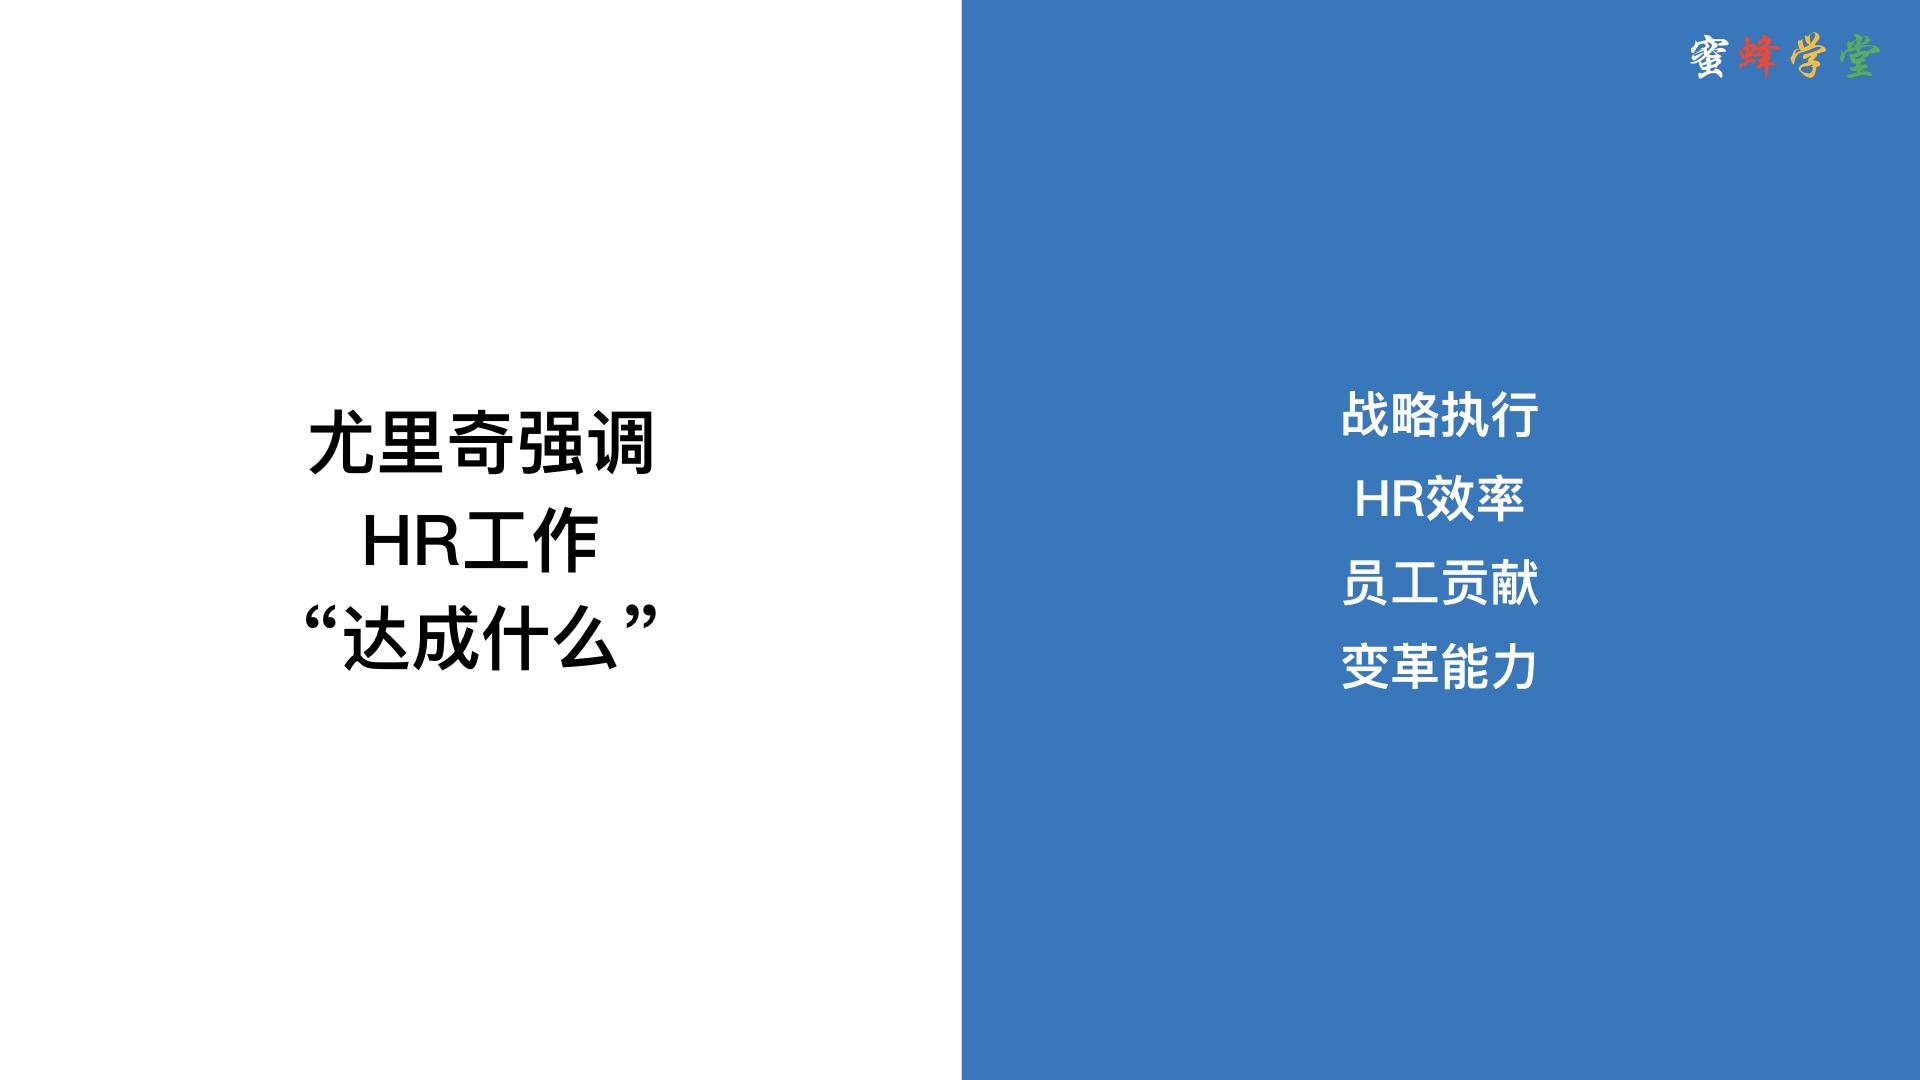 《hr人力资源转型》蜜蜂笔记(235页ppt)